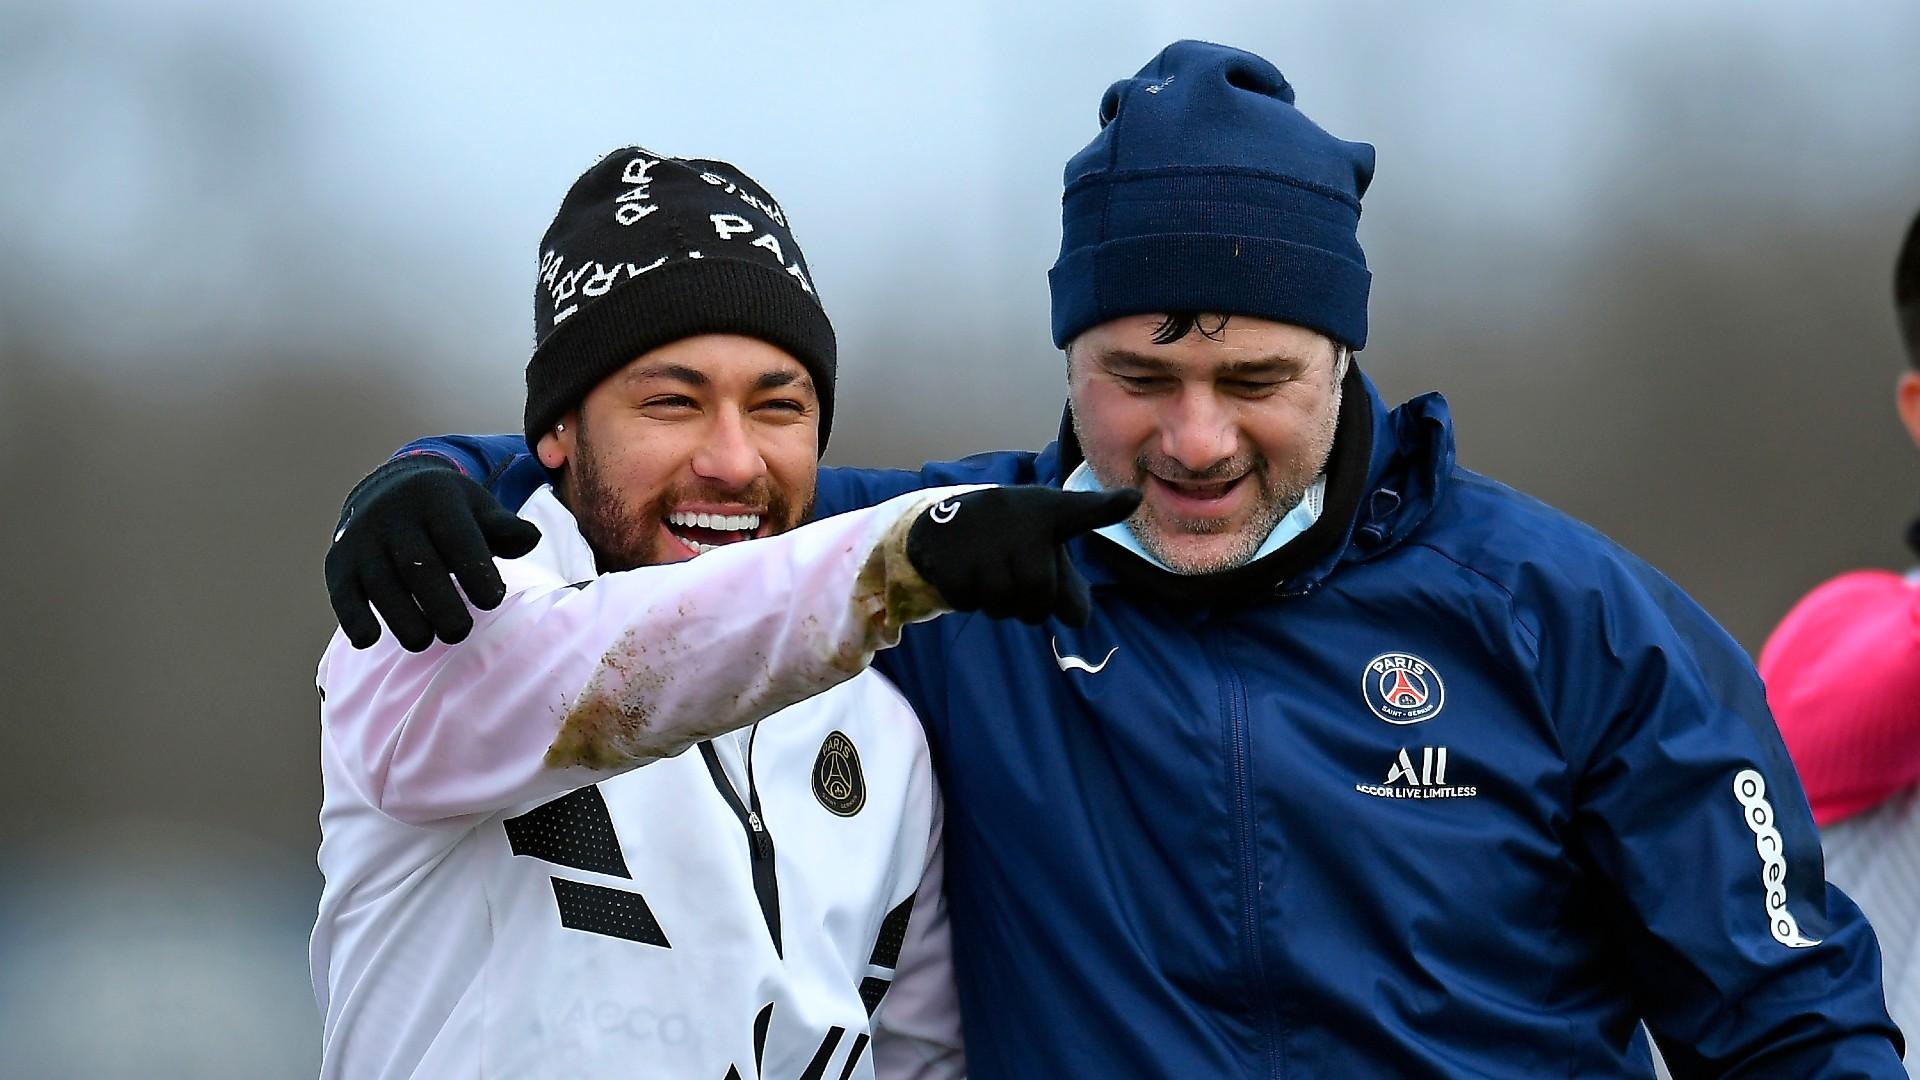 Neymar deal demonstrates PSG's ambition, says Pochettino